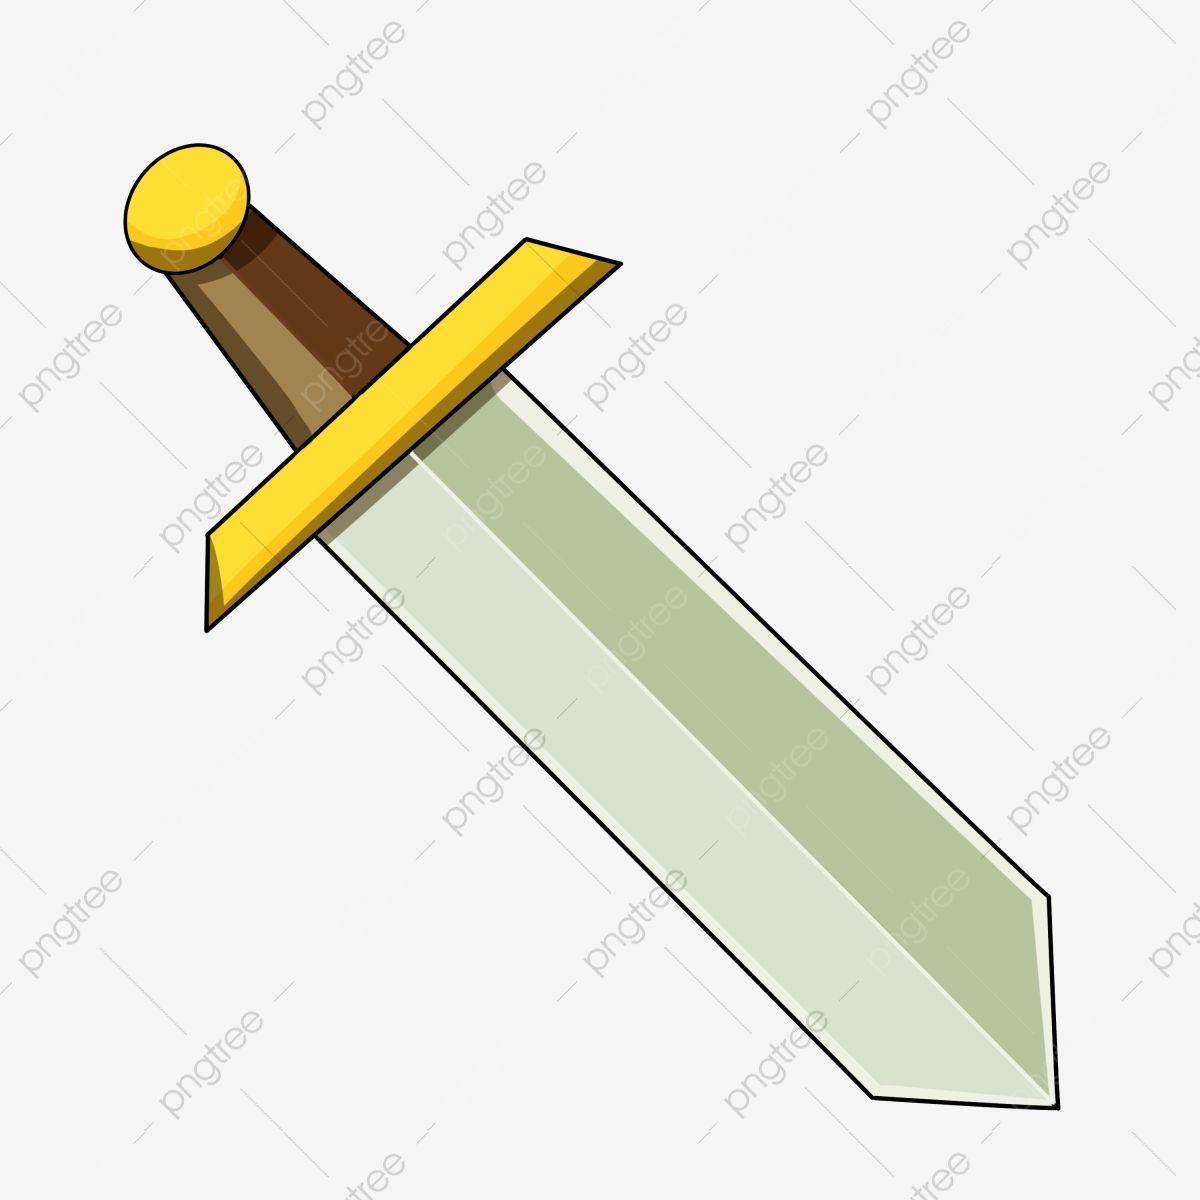 Blue Sword Blue Hand Painted Sword Sword Png And Psd Blue Sword Sword Sword Design